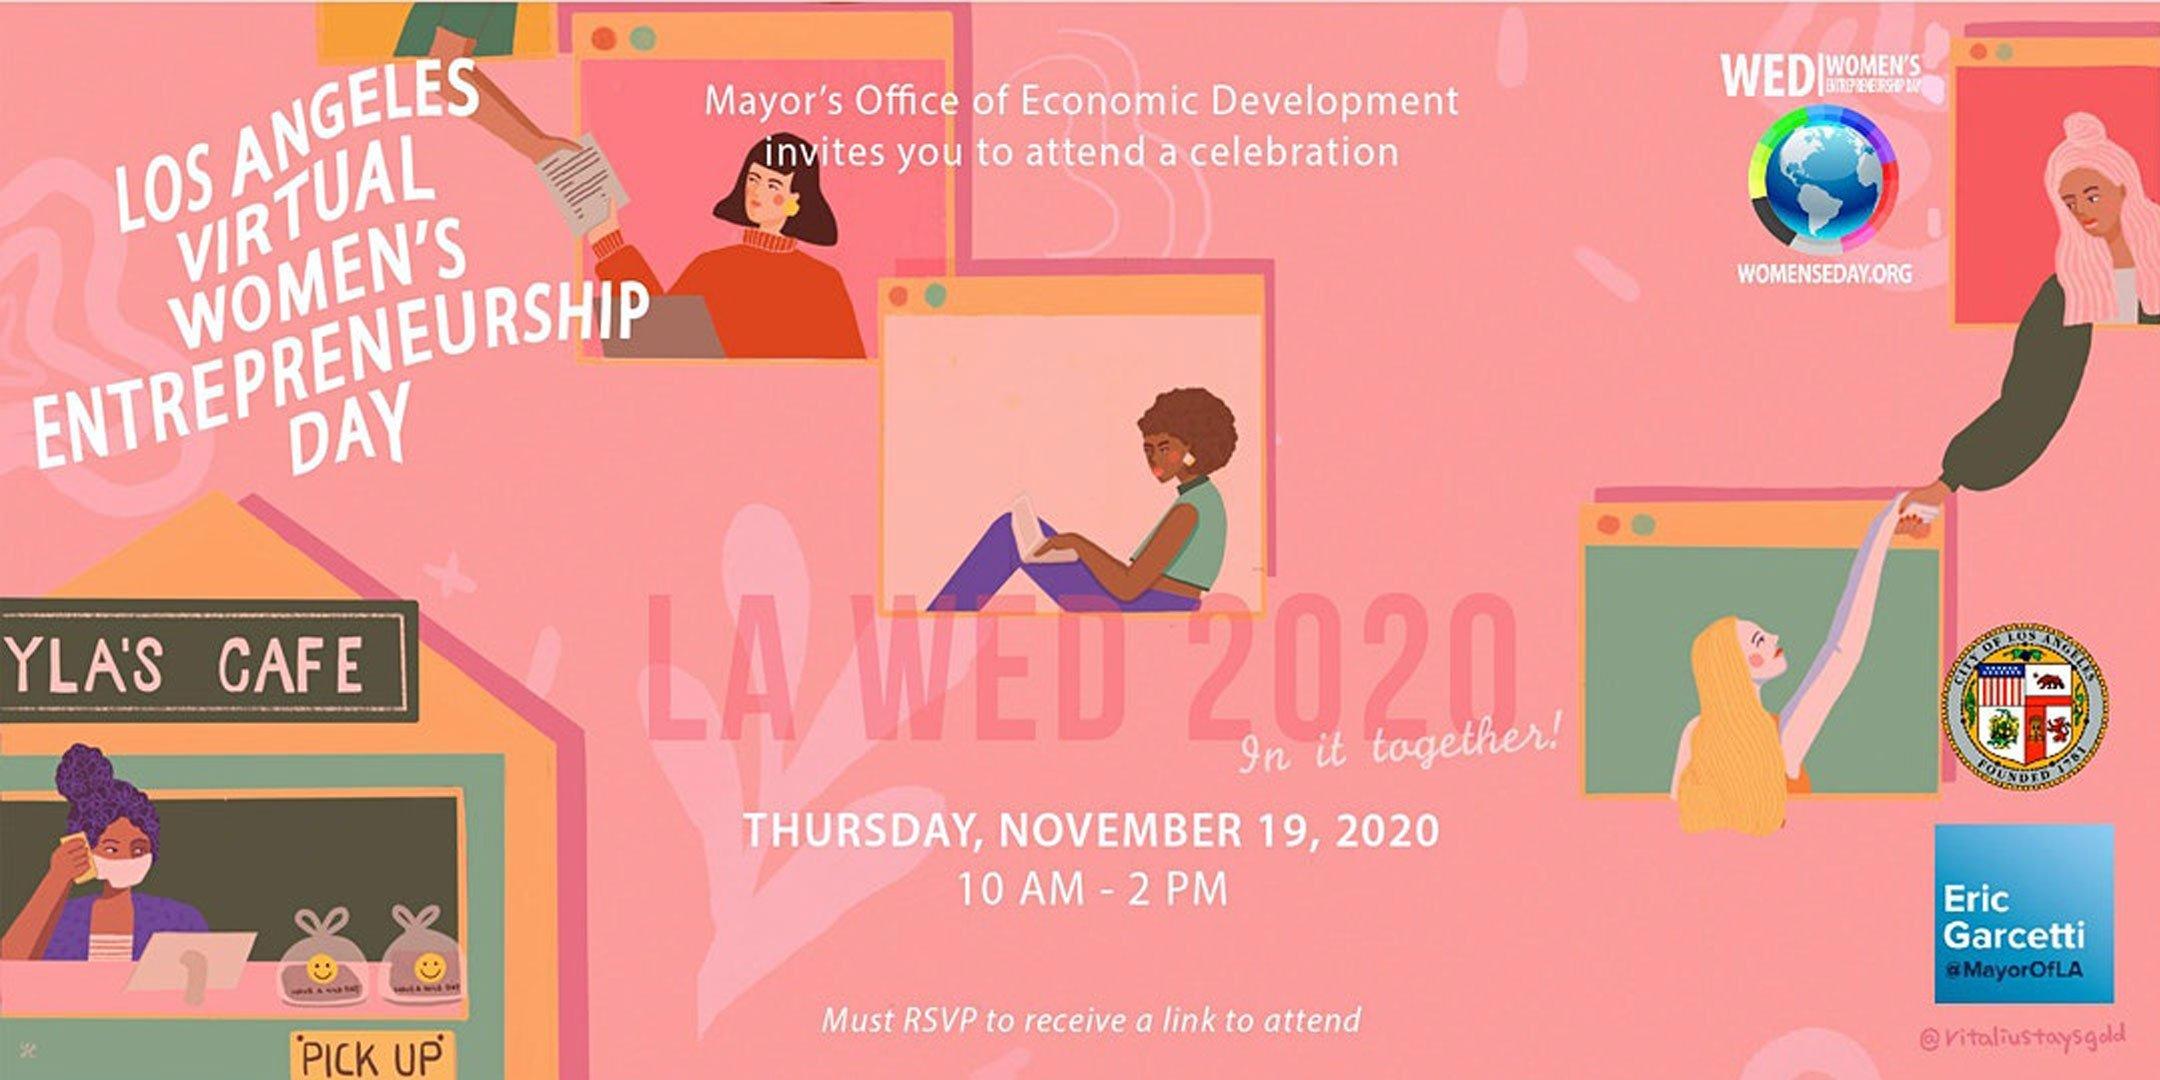 LA Virtual Women 11/19/20 event's featured image for kalika.com